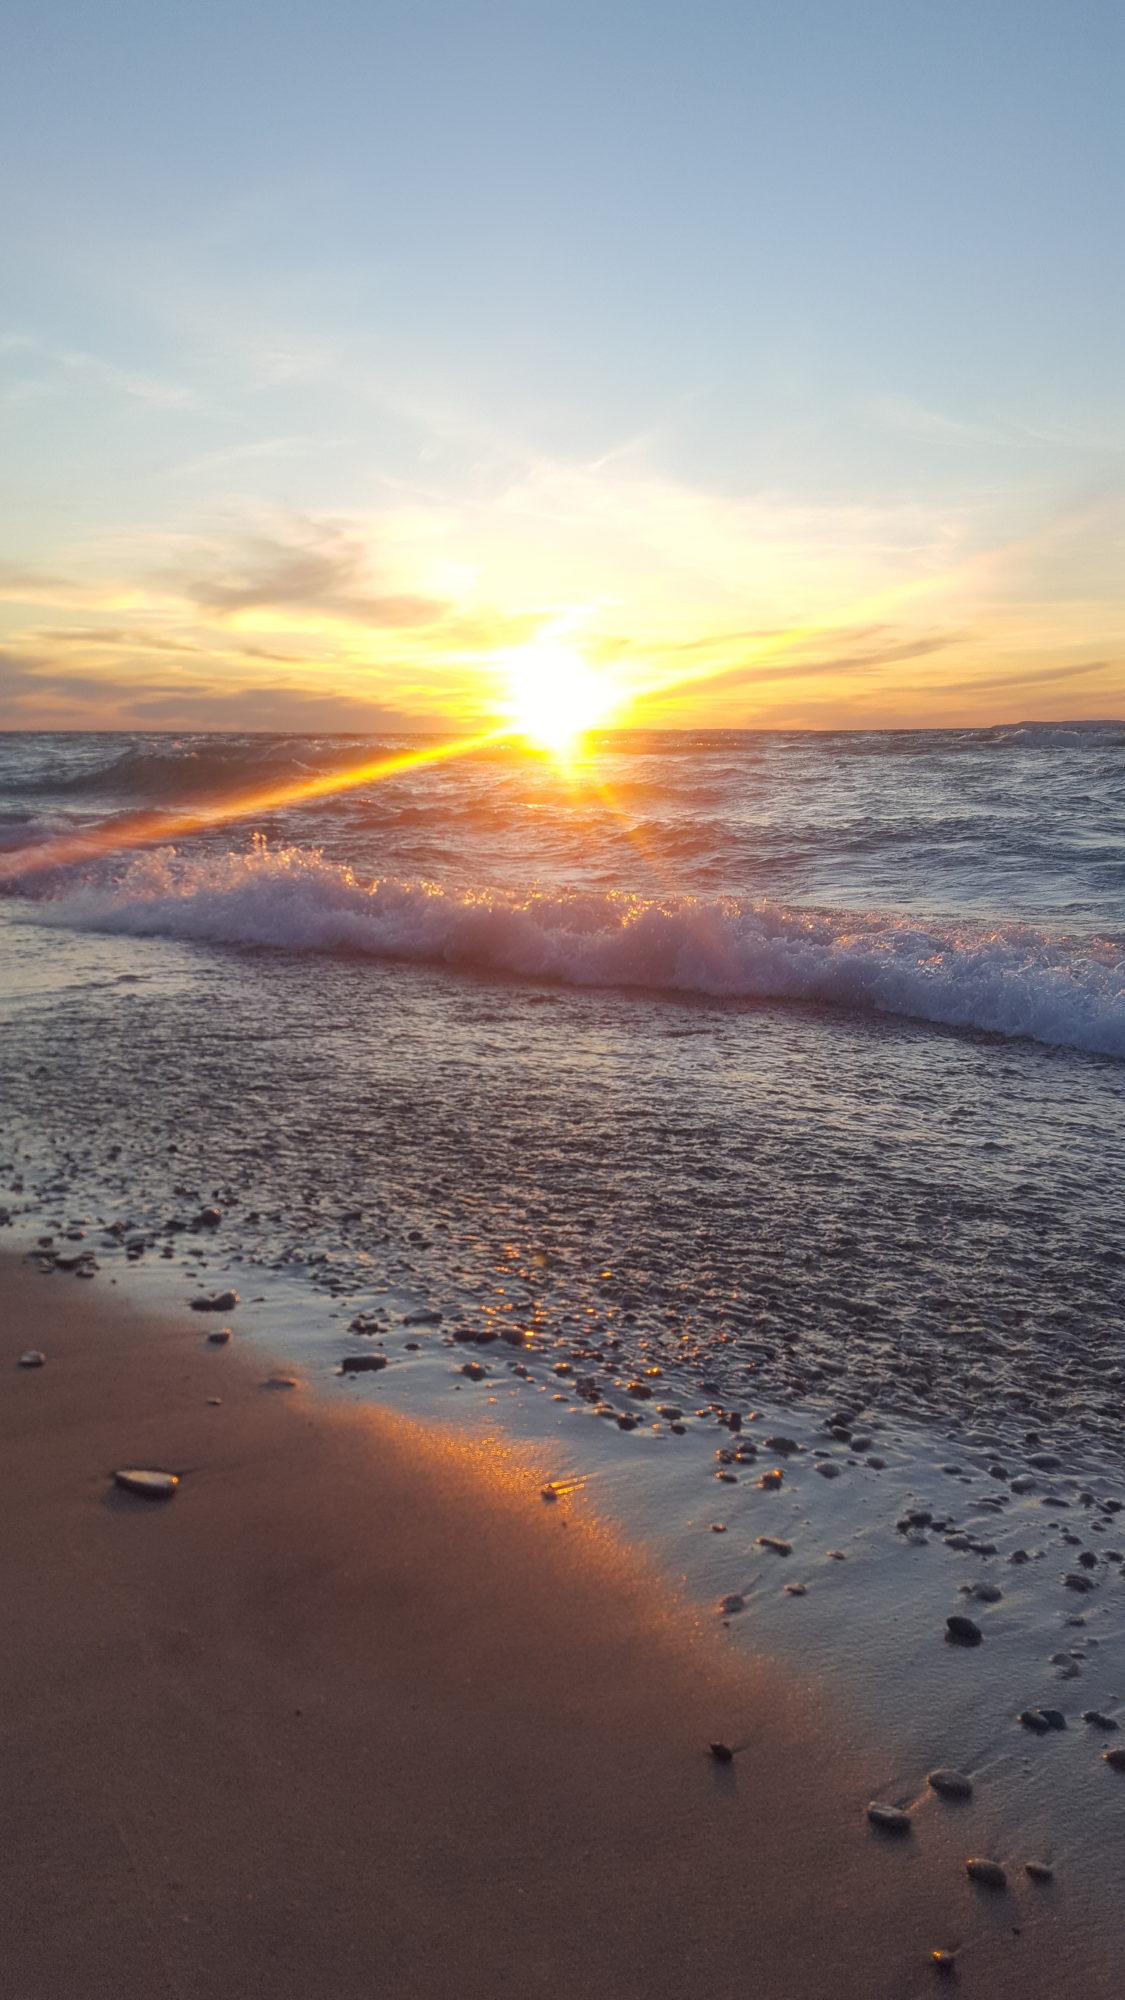 A Beautiful sunset on Lake Michigan at Van's Beach in Leelanau County, Michigan.